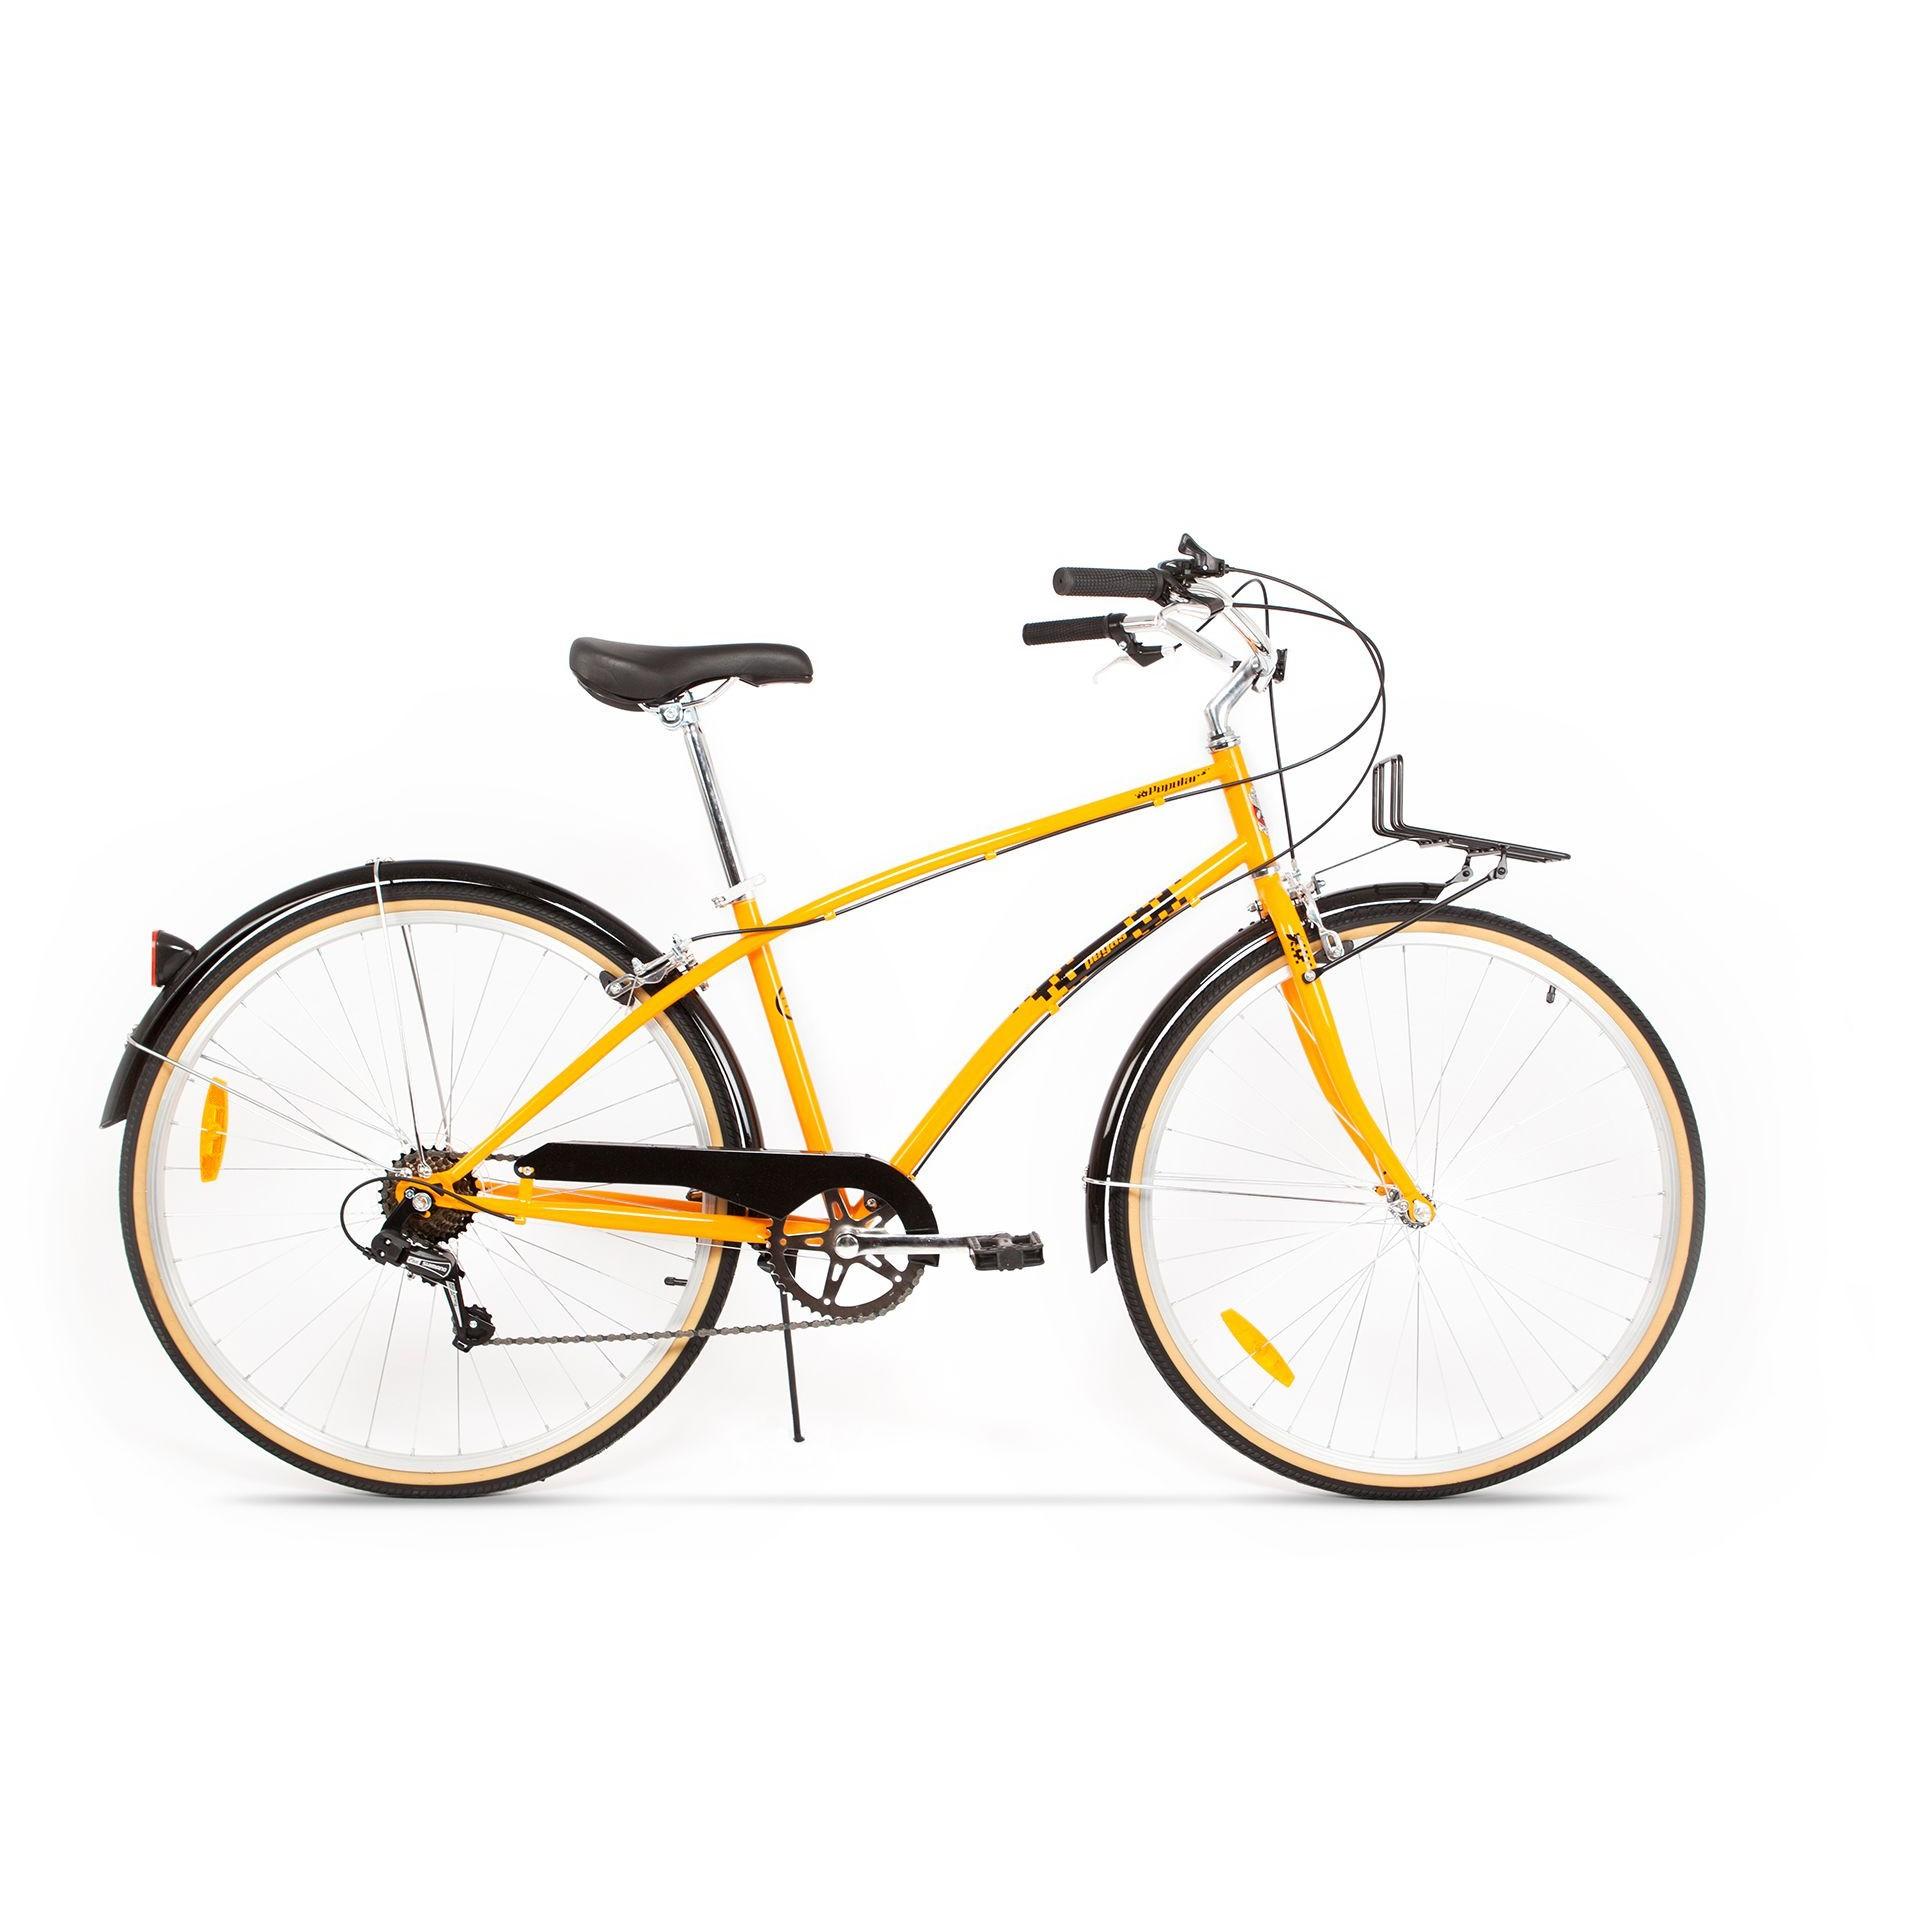 Femeie de biciclete intalnire)